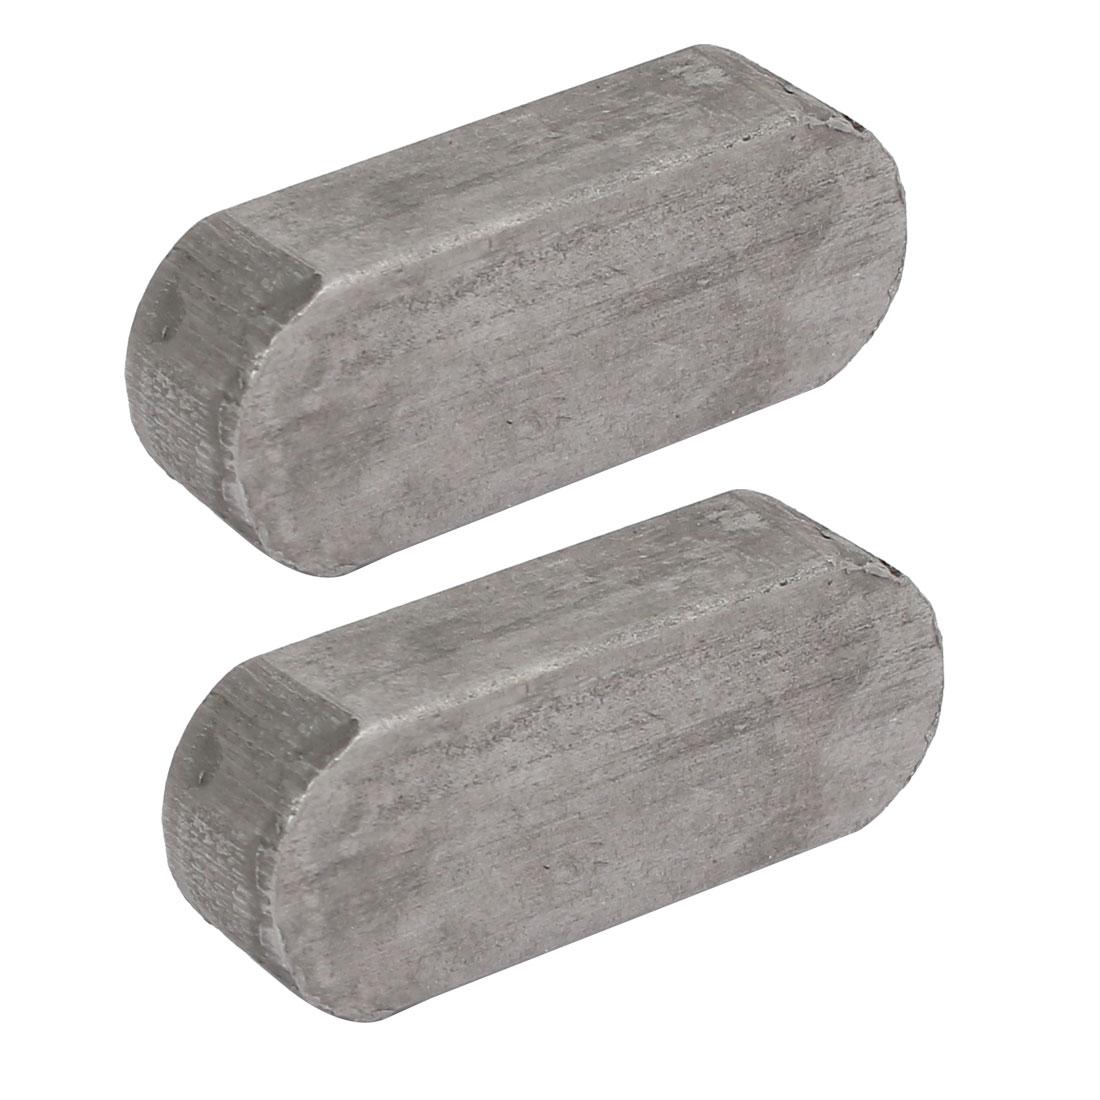 40mmx16mmx10mm Carbon Steel Key Stock To Lock Pulleys 2pcs